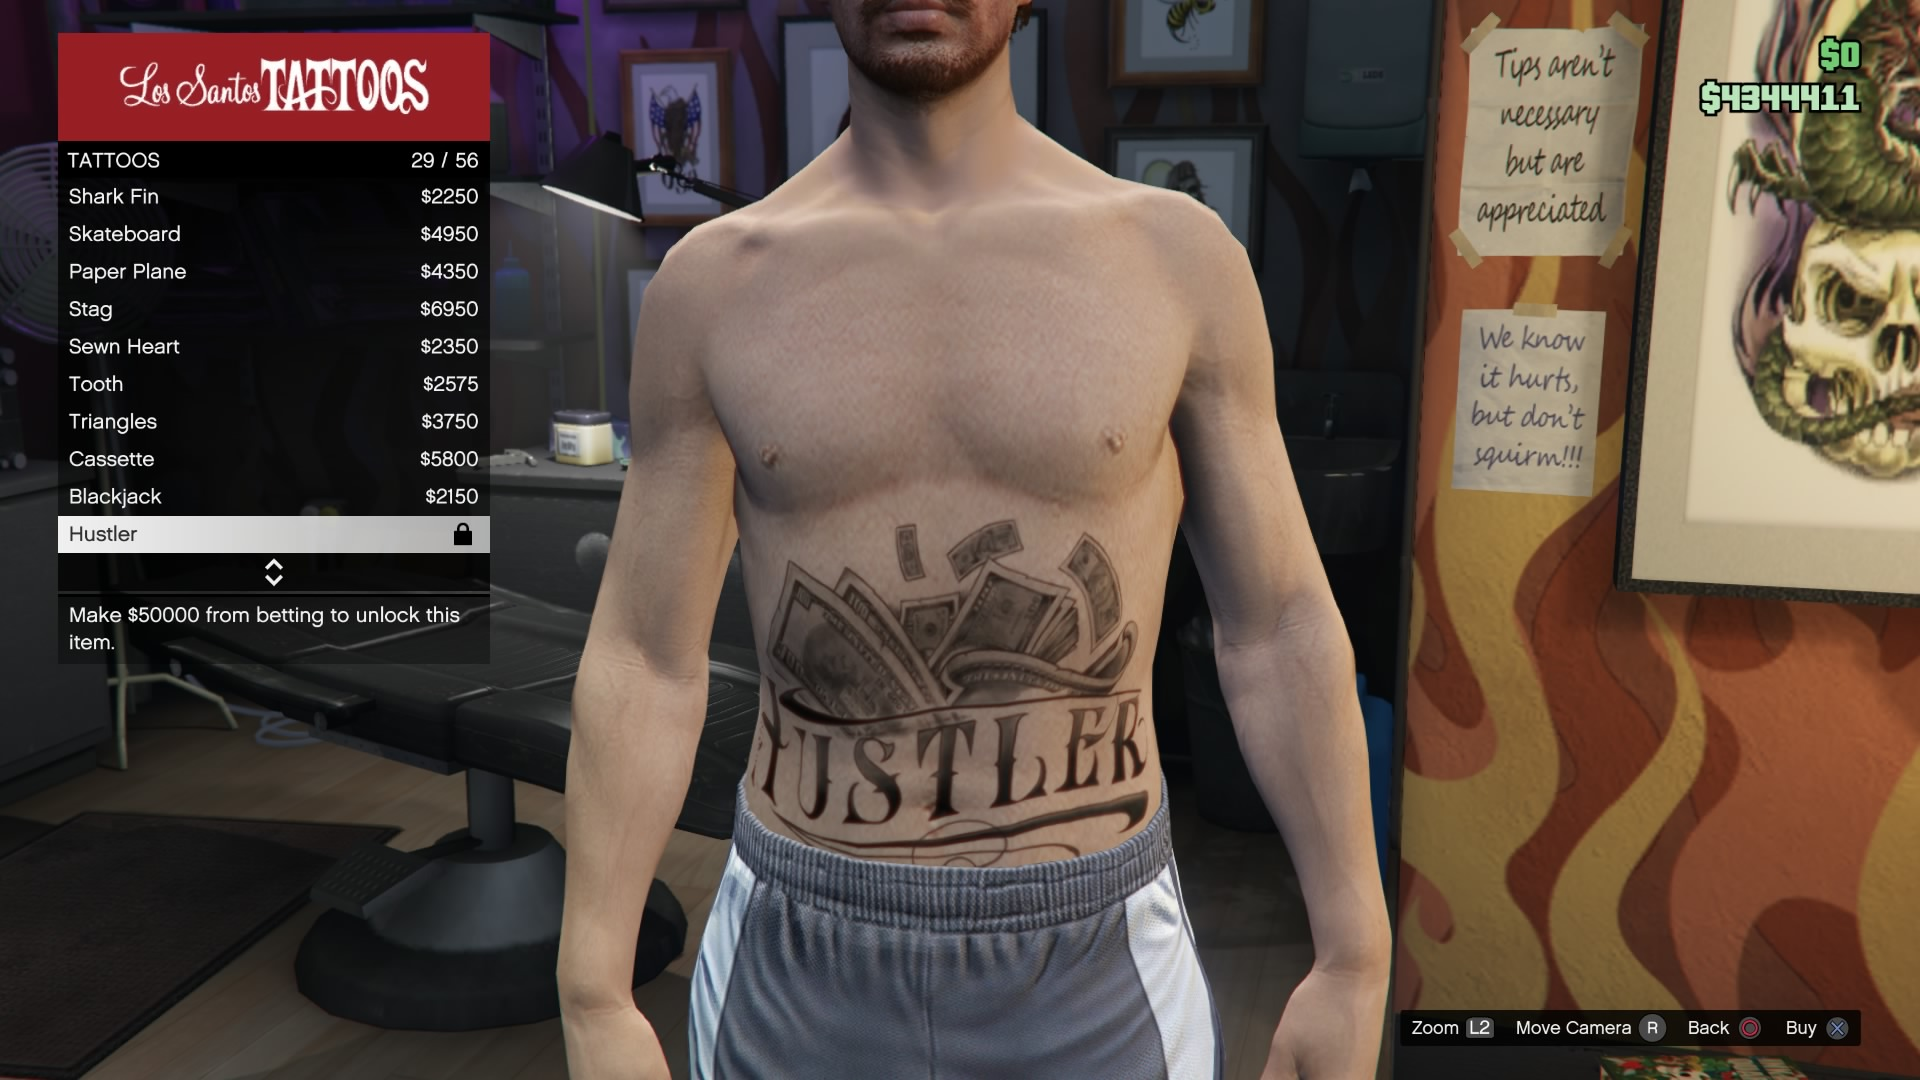 Hustler on line